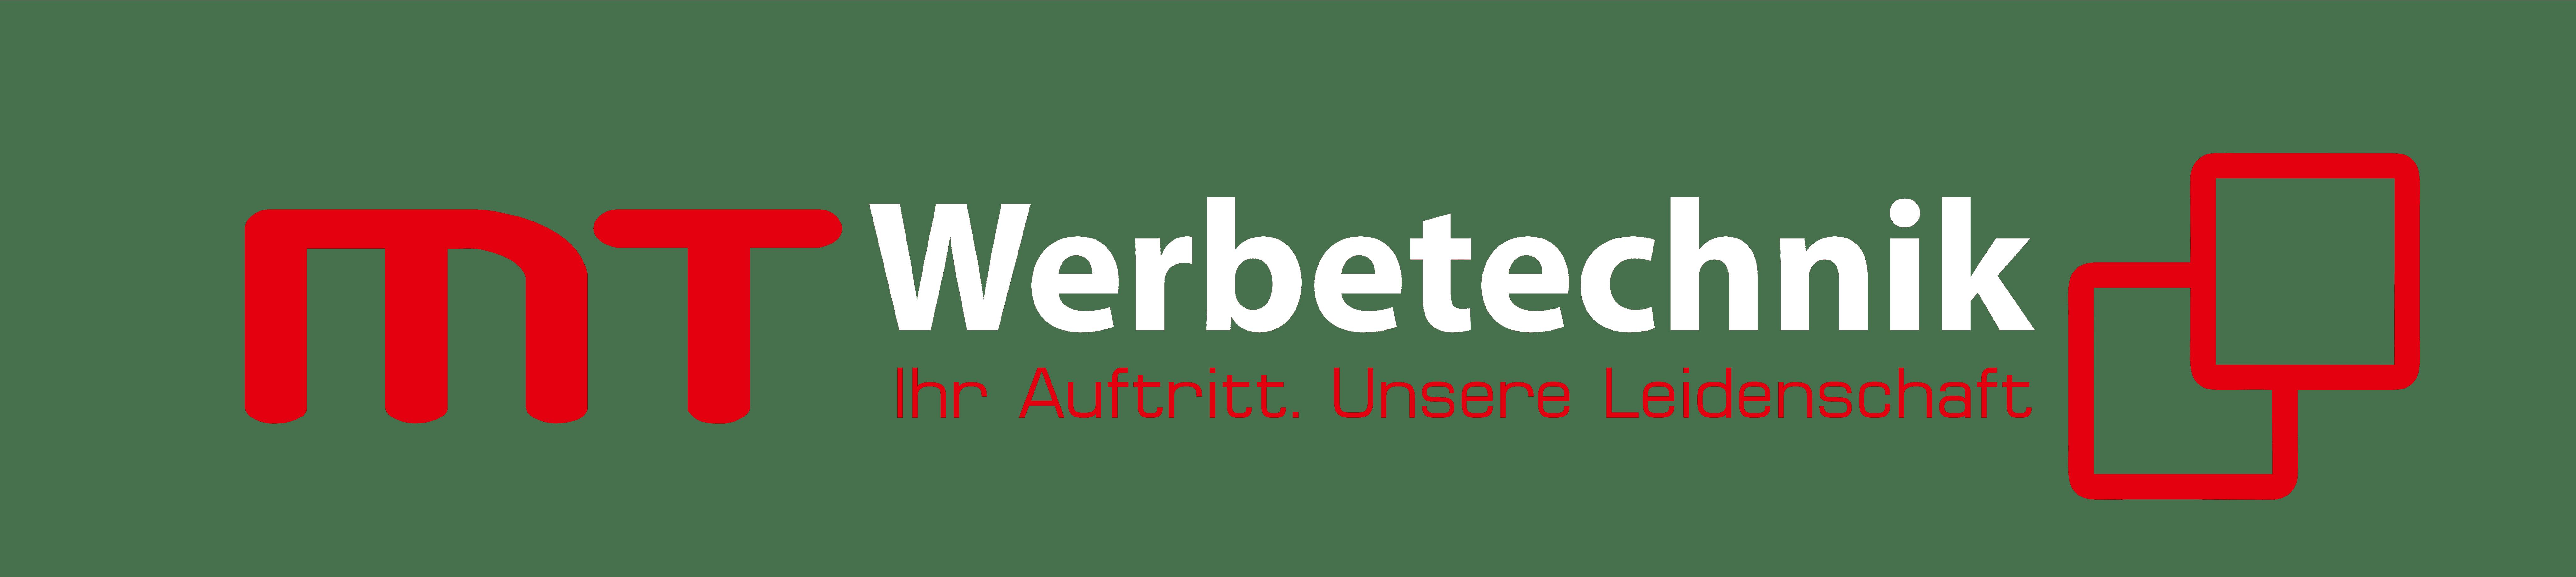 Mt werbetechnikg